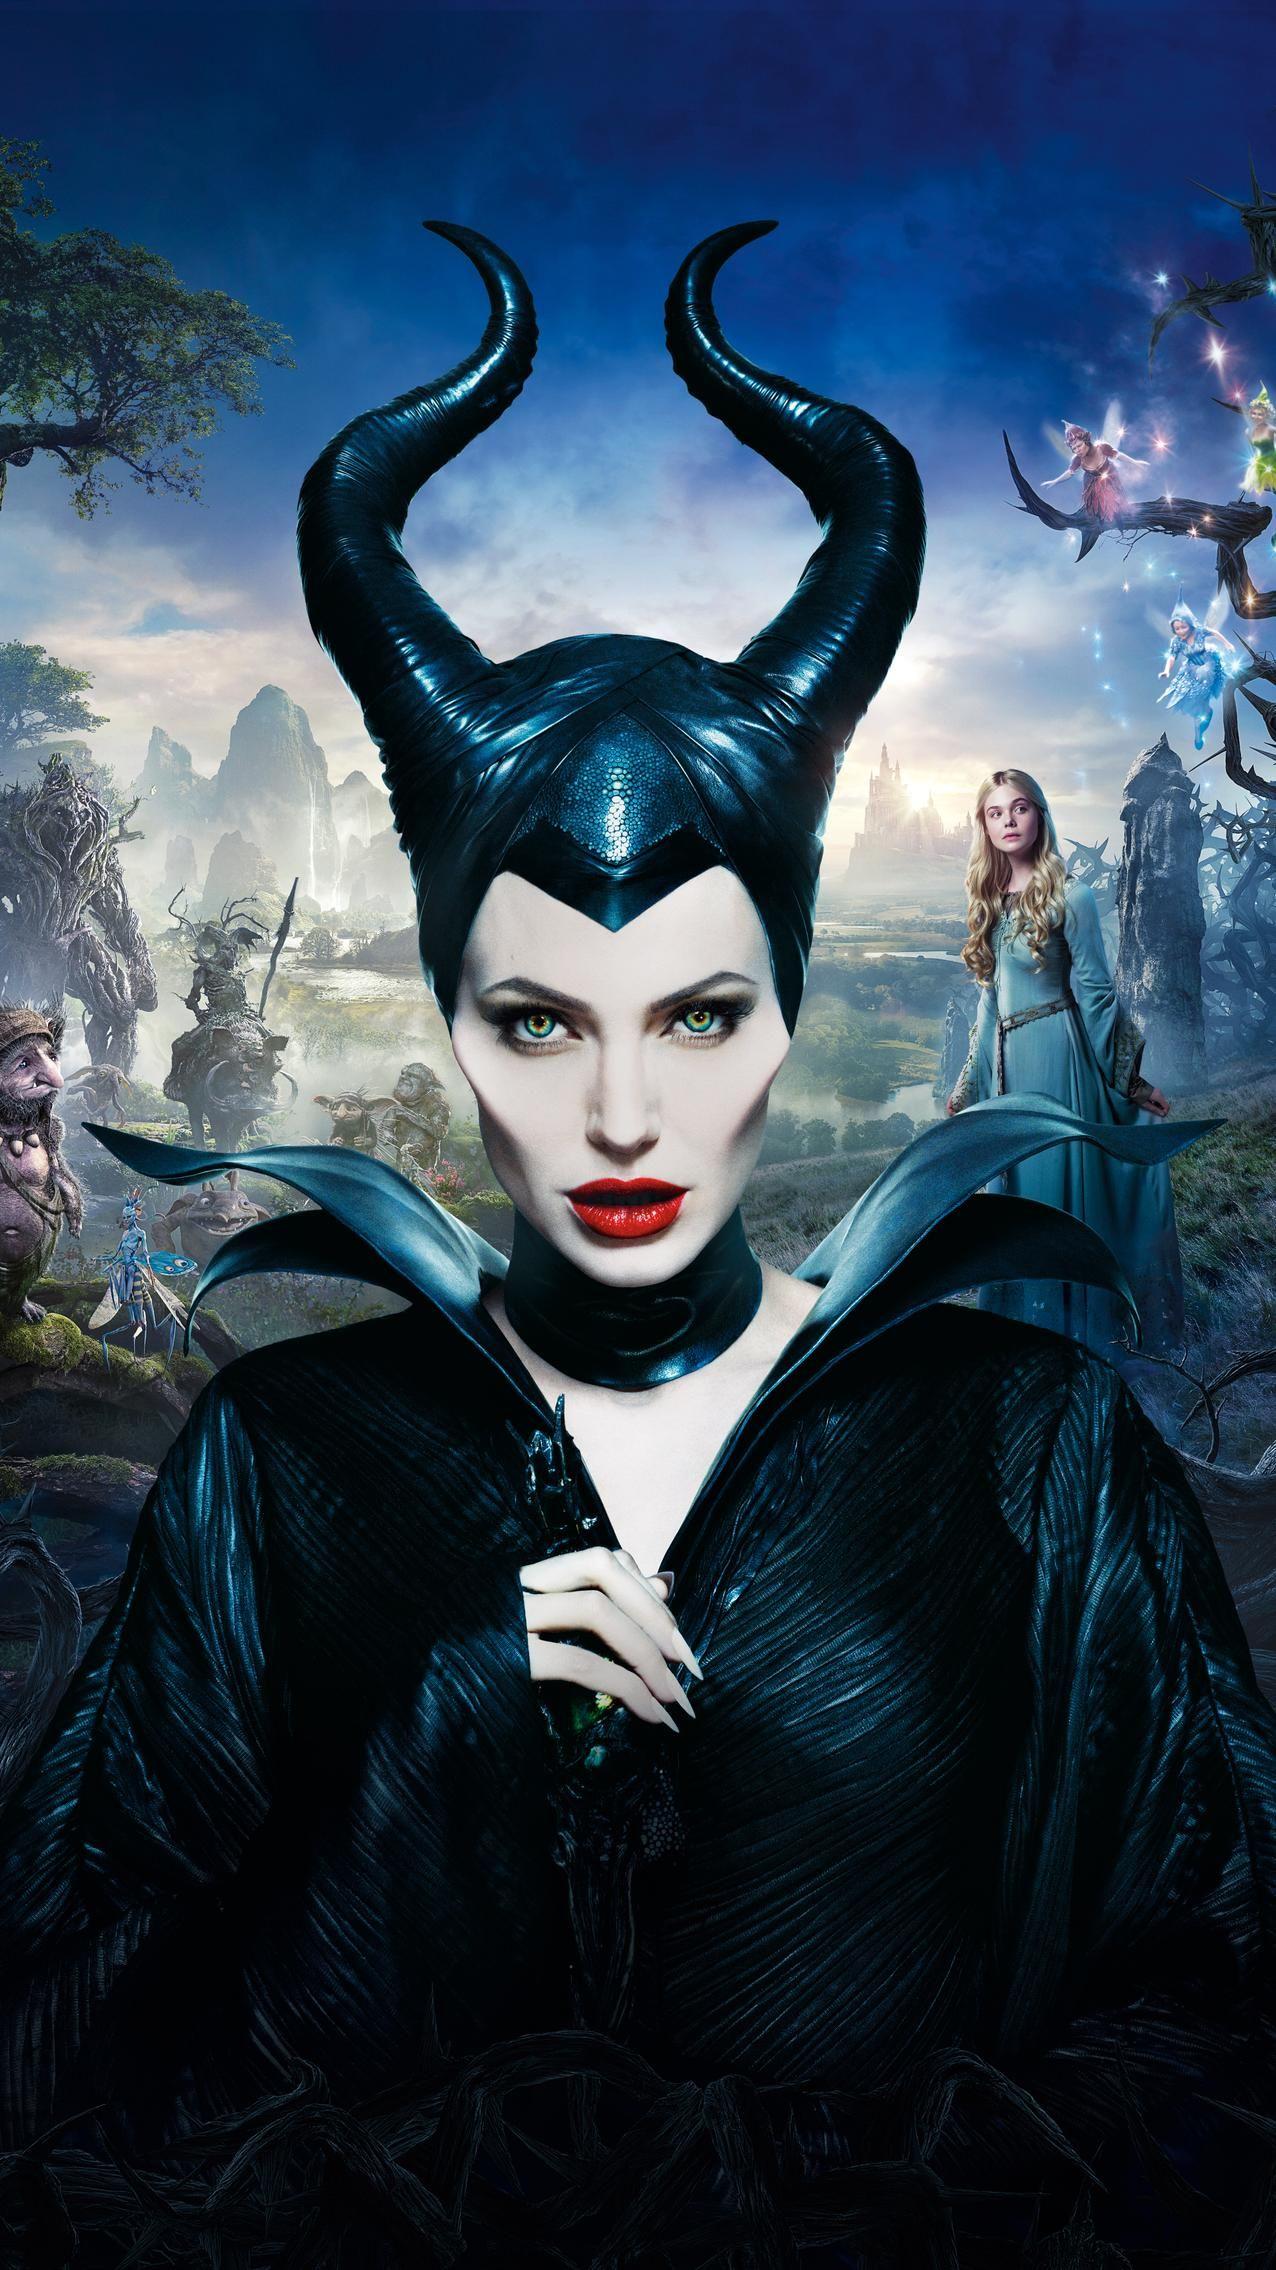 Maleficent 2014 Phone Wallpaper Moviemania Maleficent Movie Maleficent 2014 Maleficent